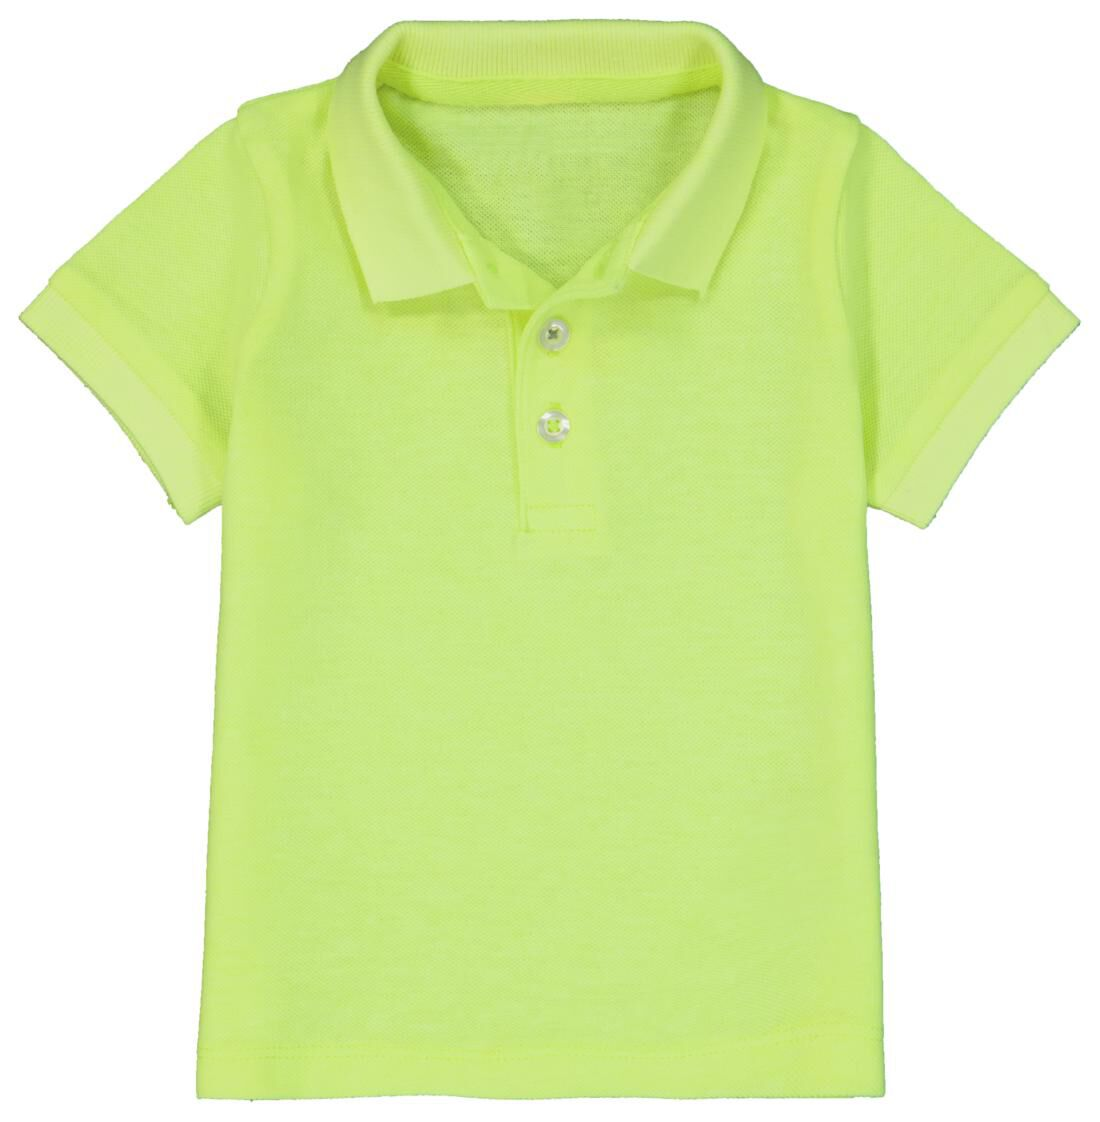 HEMA Babypolo Lime (lime)